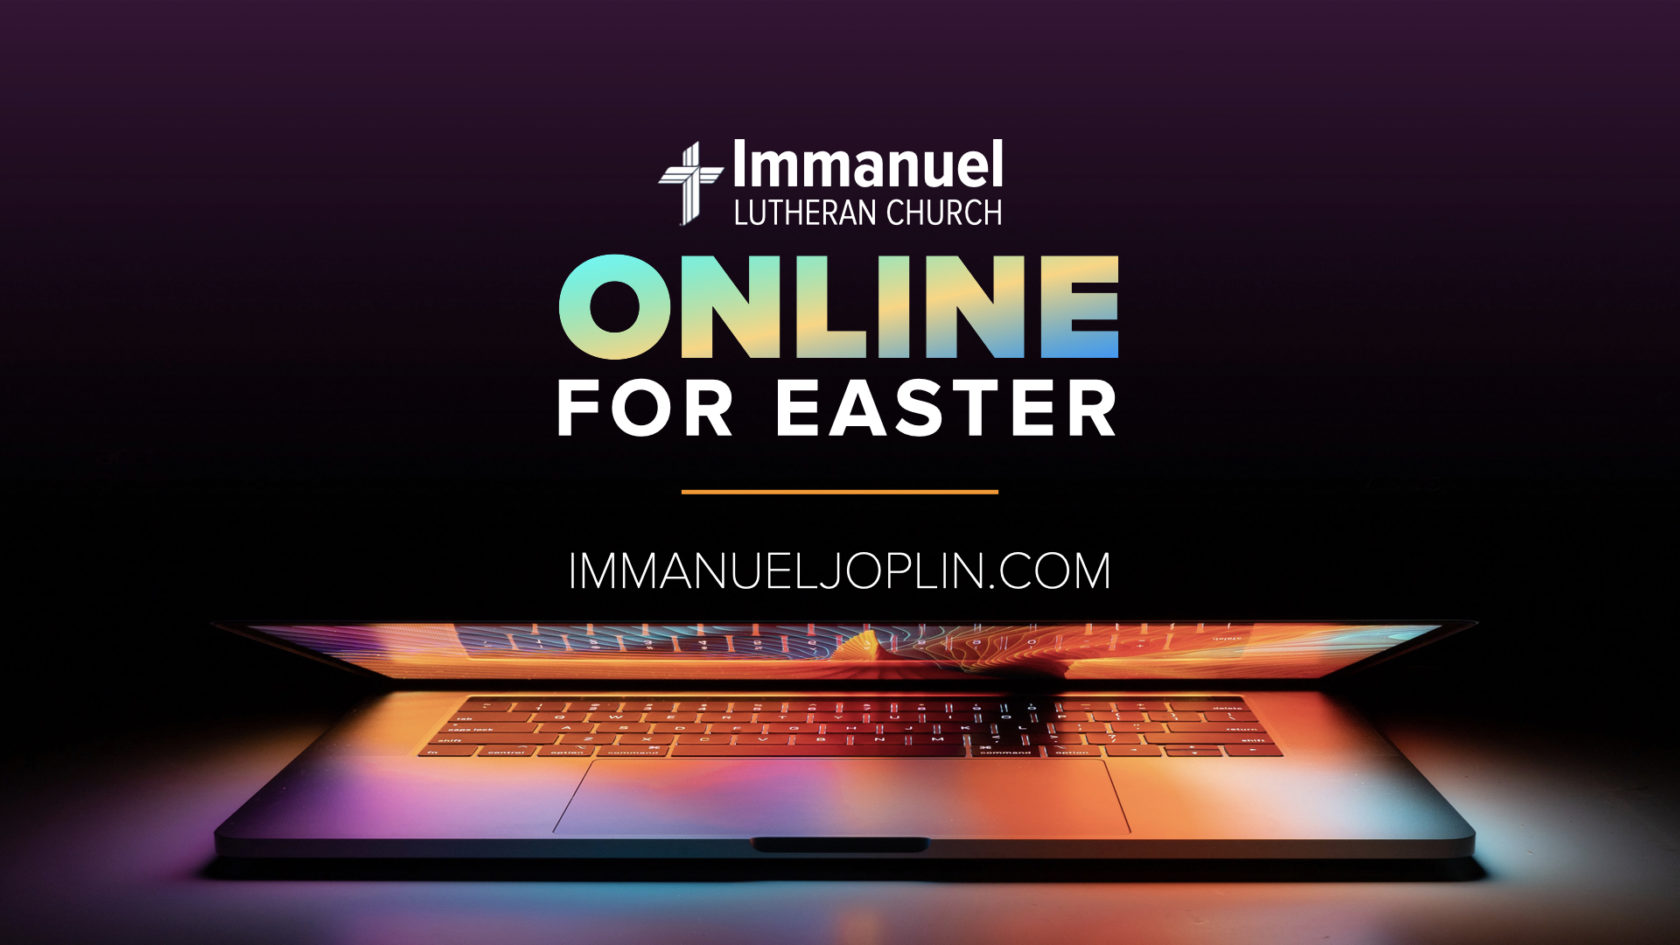 ONLINE for Easter. Immanuel Lutheran Church LCMS. Joplin, Missouri. immanueljoplin.com